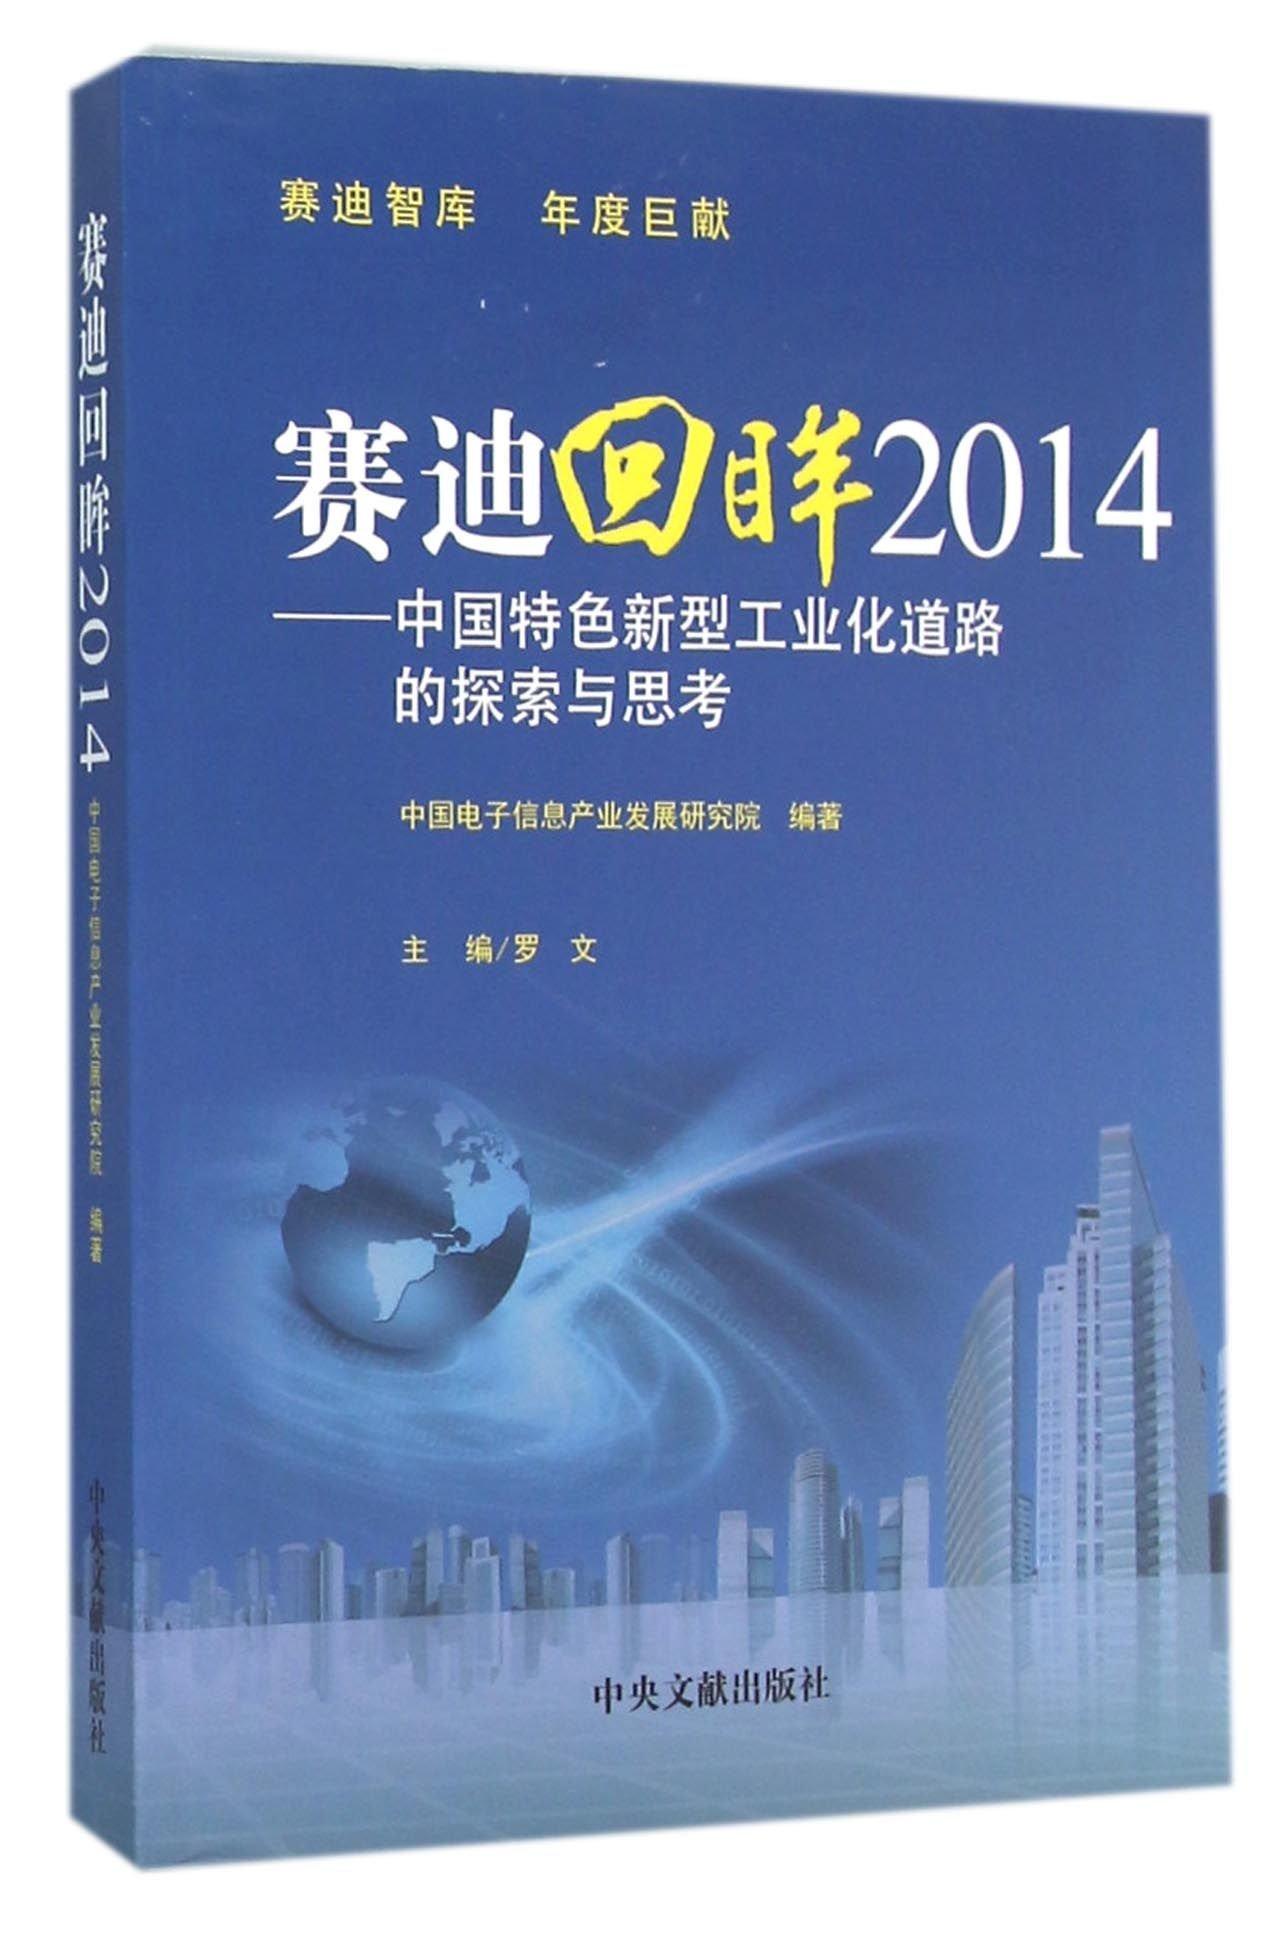 Download 赛迪回眸2014中国特色新型工业化道路的探索与思考 pdf epub